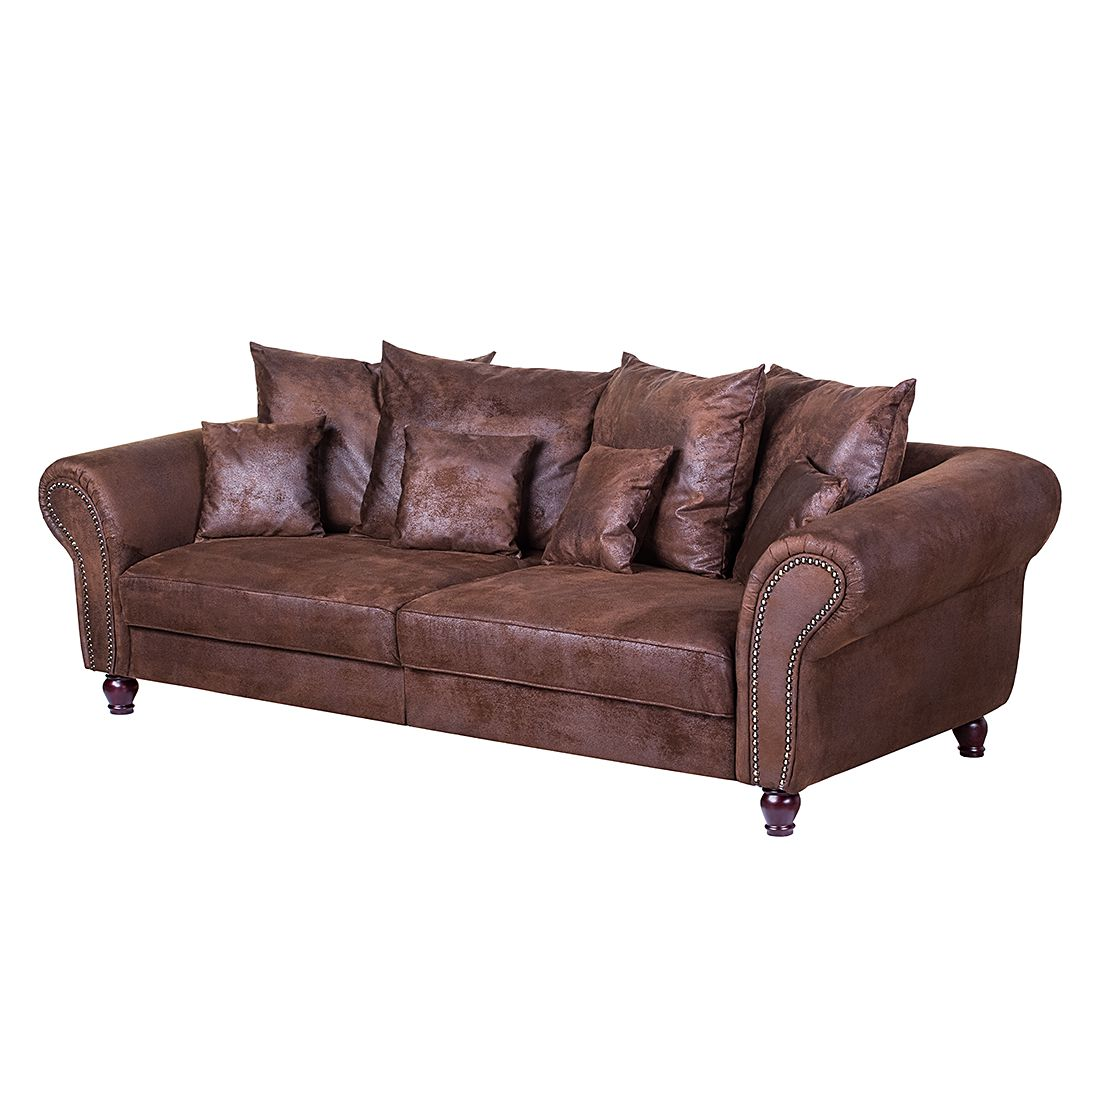 Big Sofa Reduziert Ars Manufacti Preisvergleiche